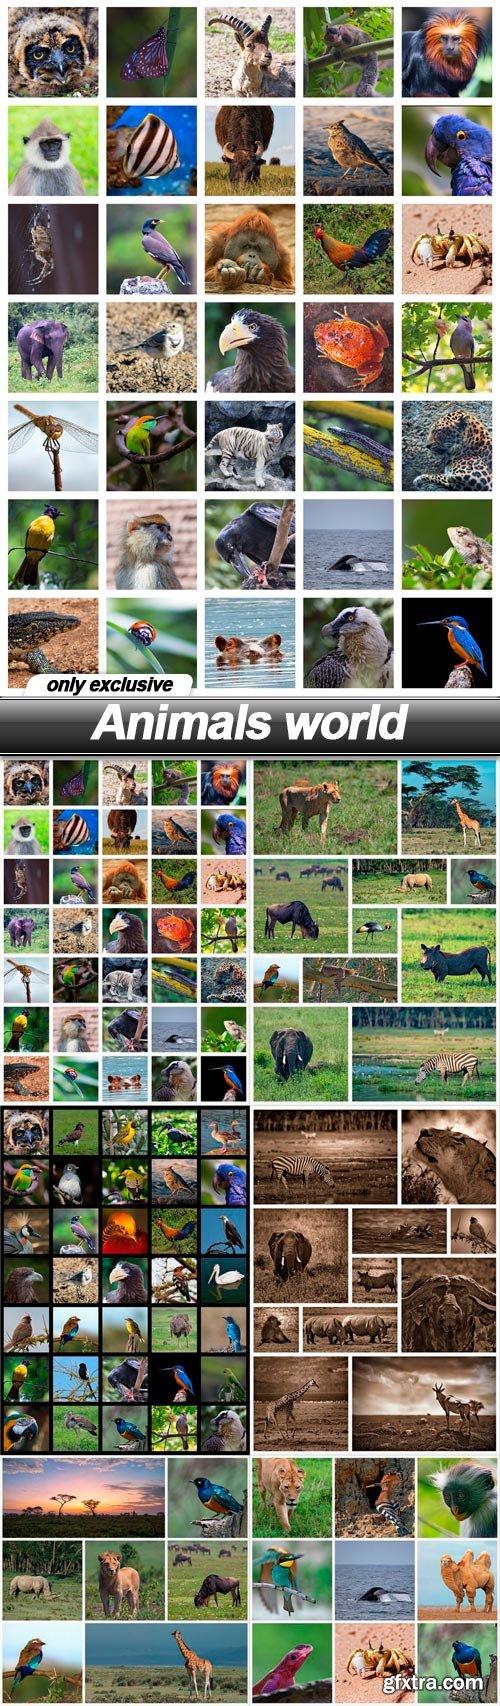 Animals world - 6 UHQ JPEG